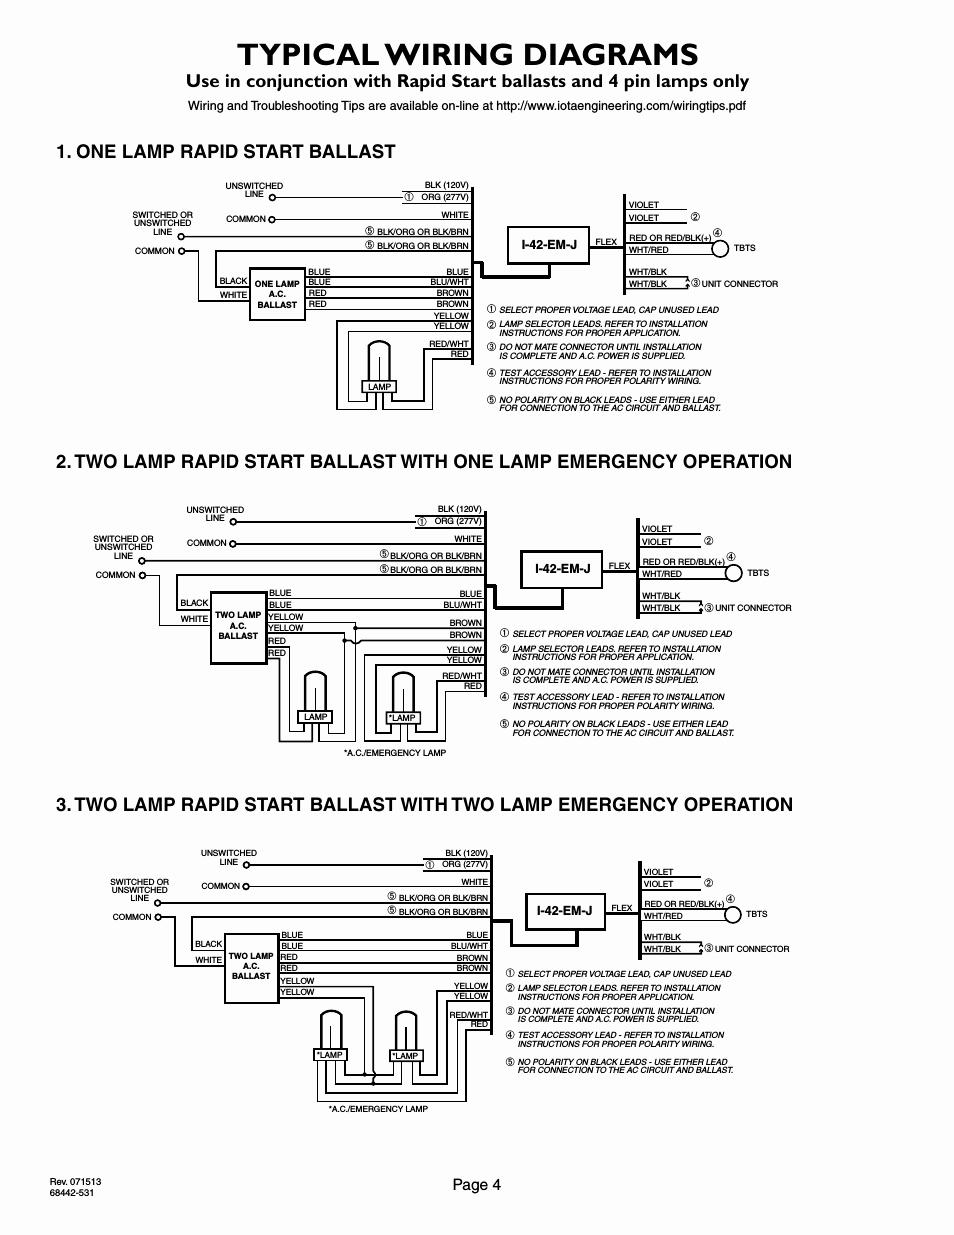 iota i320 emergency ballast wiring diagram Collection-Wiring Diagram Philips Advance Ballast Wiring Diagram Best Exelent Electronic Emergency Ballast Wiring Diagram Ponent 1-c